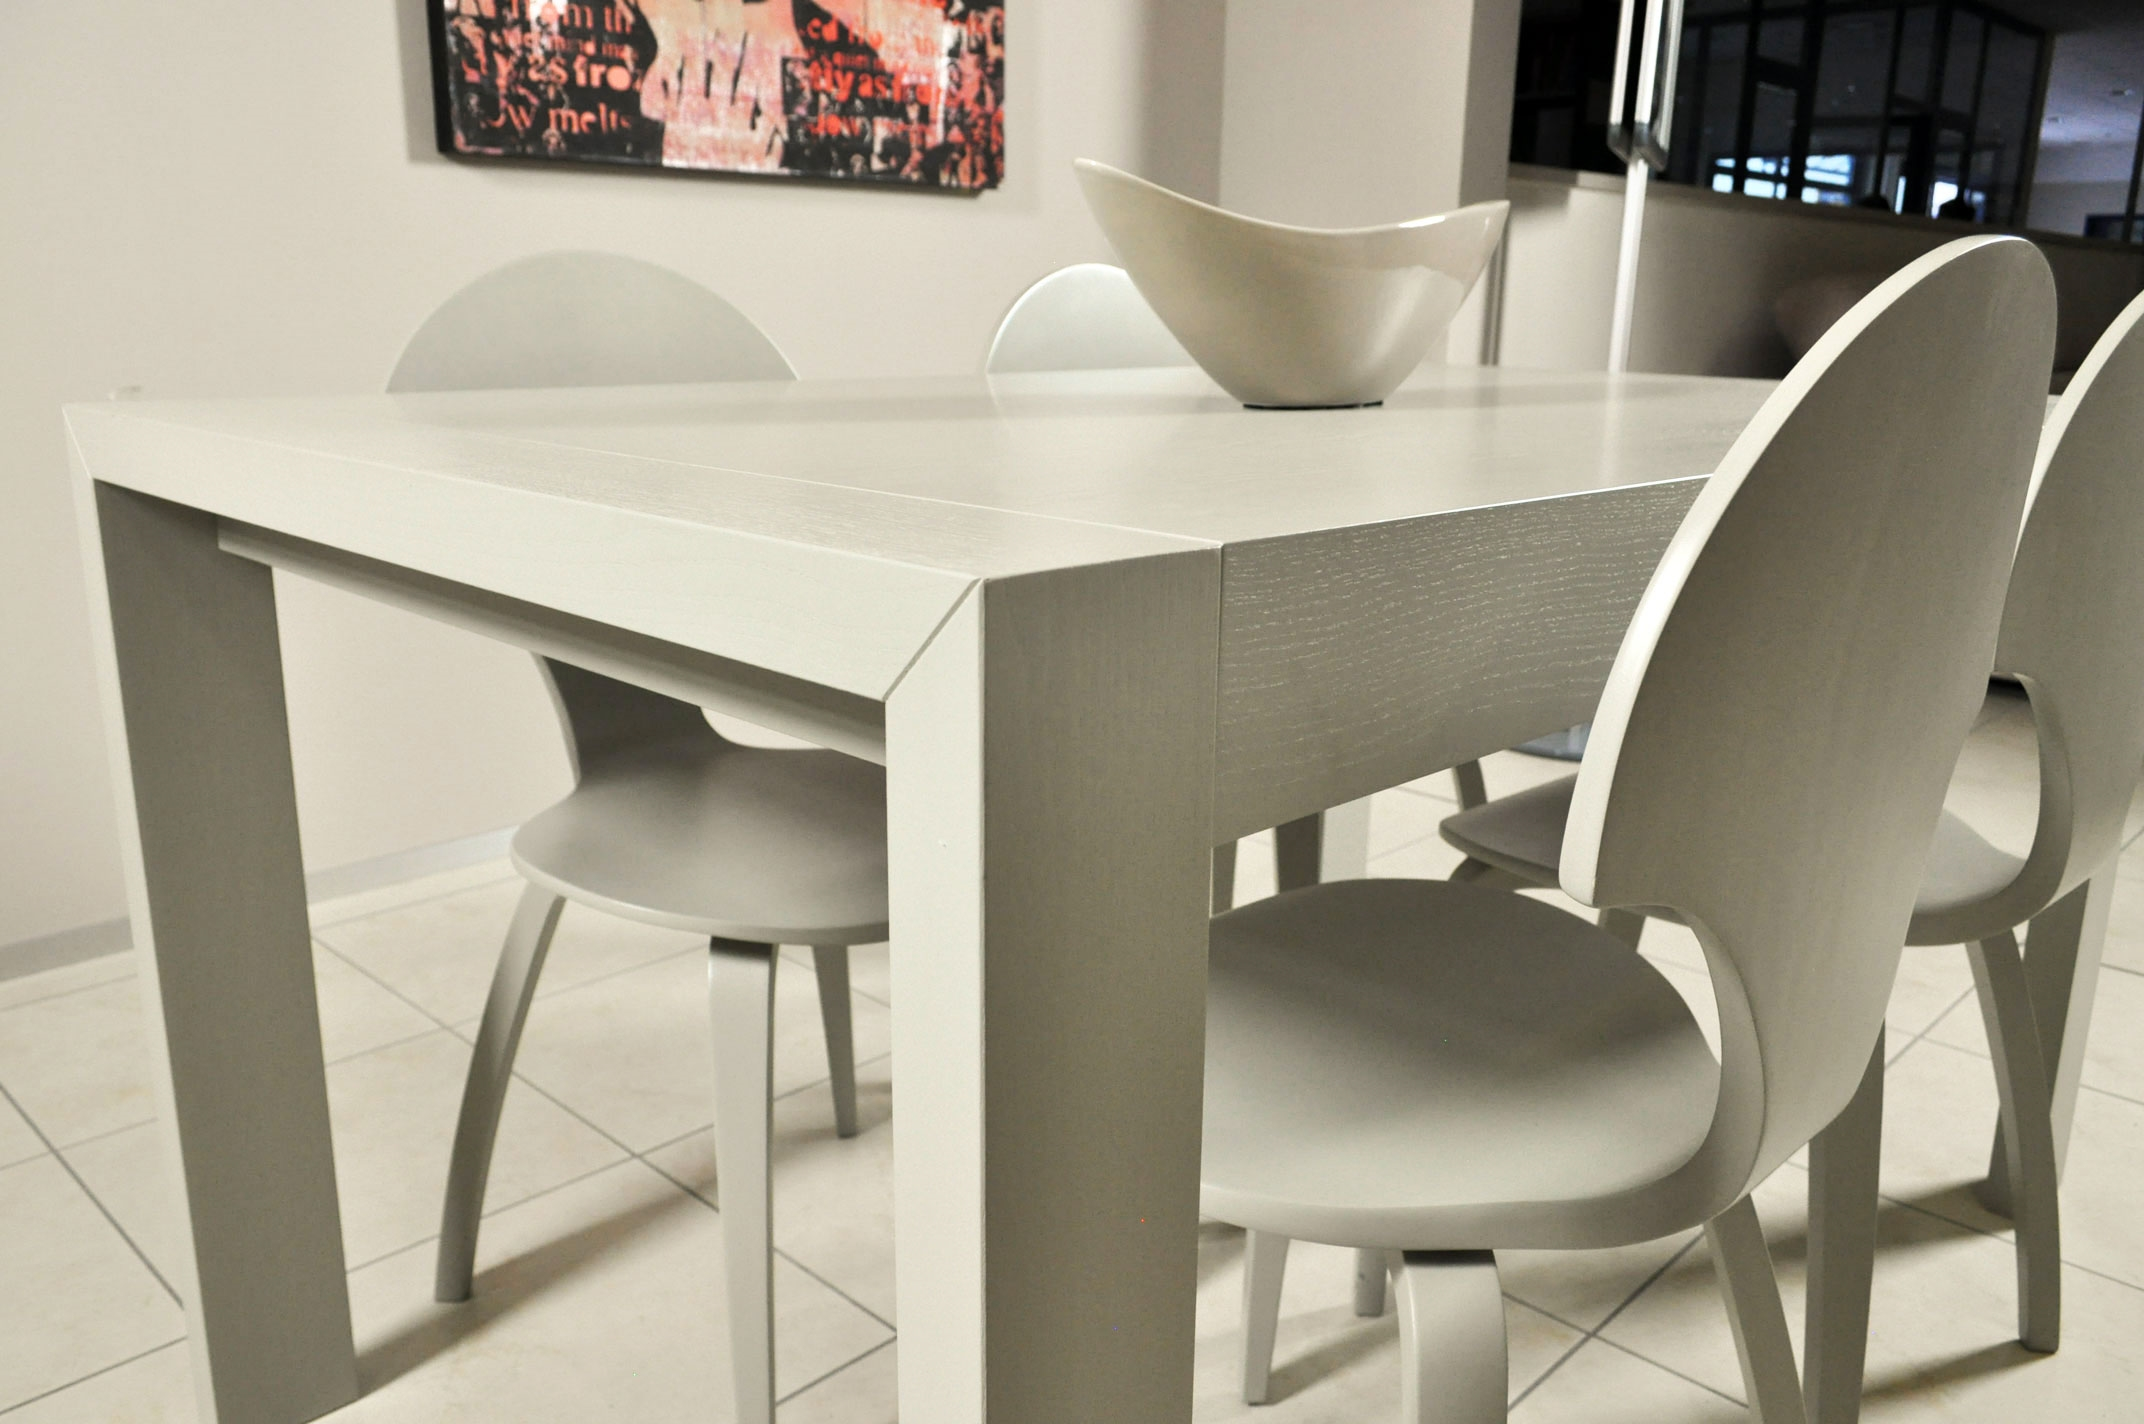 Offerte tavoli e sedie da giardino for Offerte tavoli da esterno